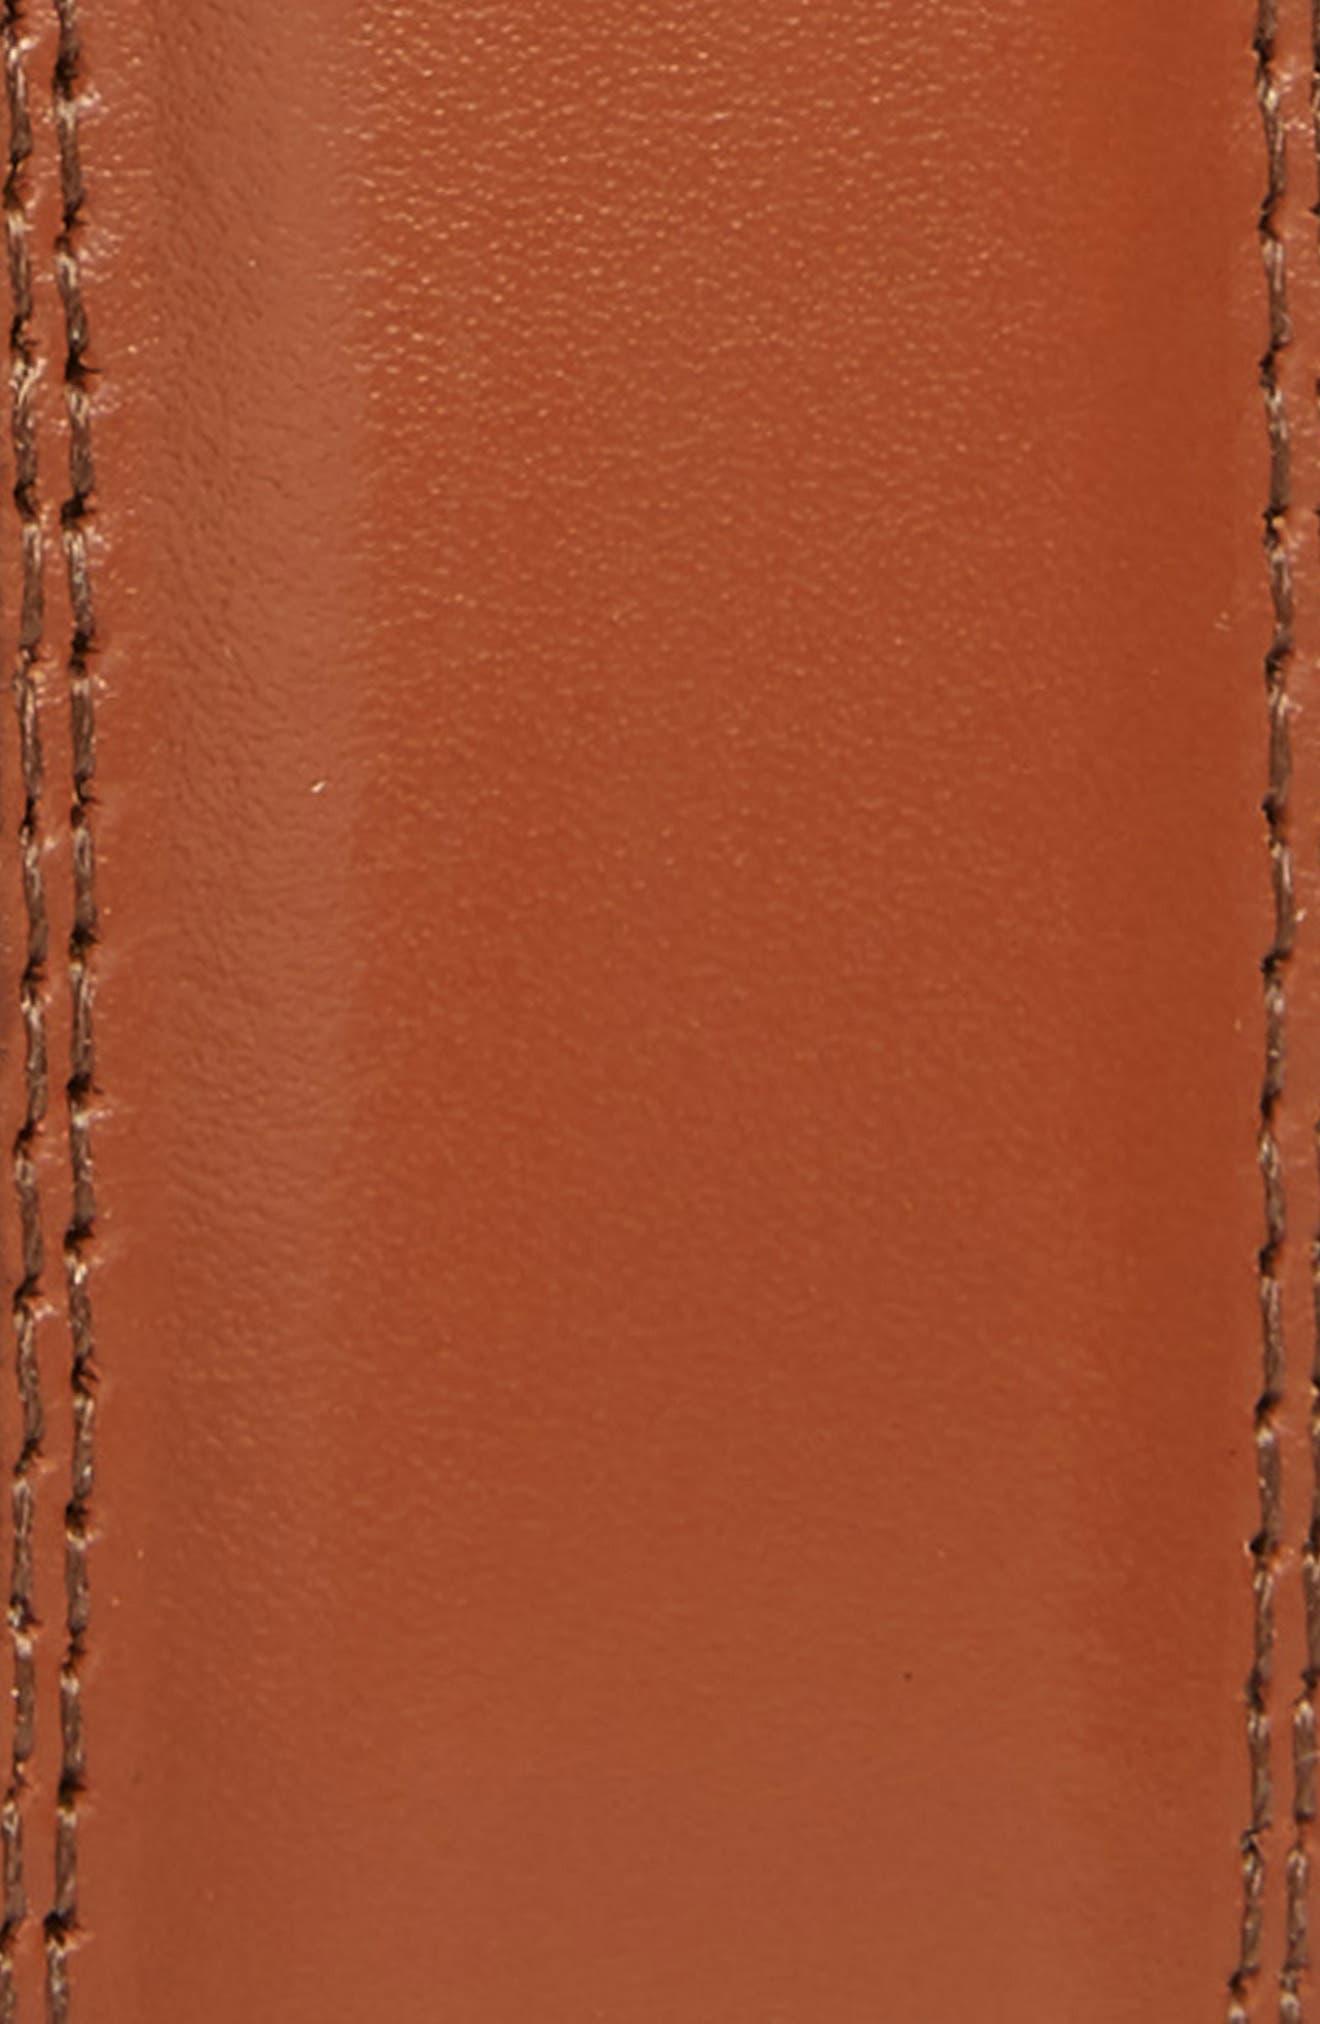 Aniline Leather Belt,                             Alternate thumbnail 2, color,                             TAN